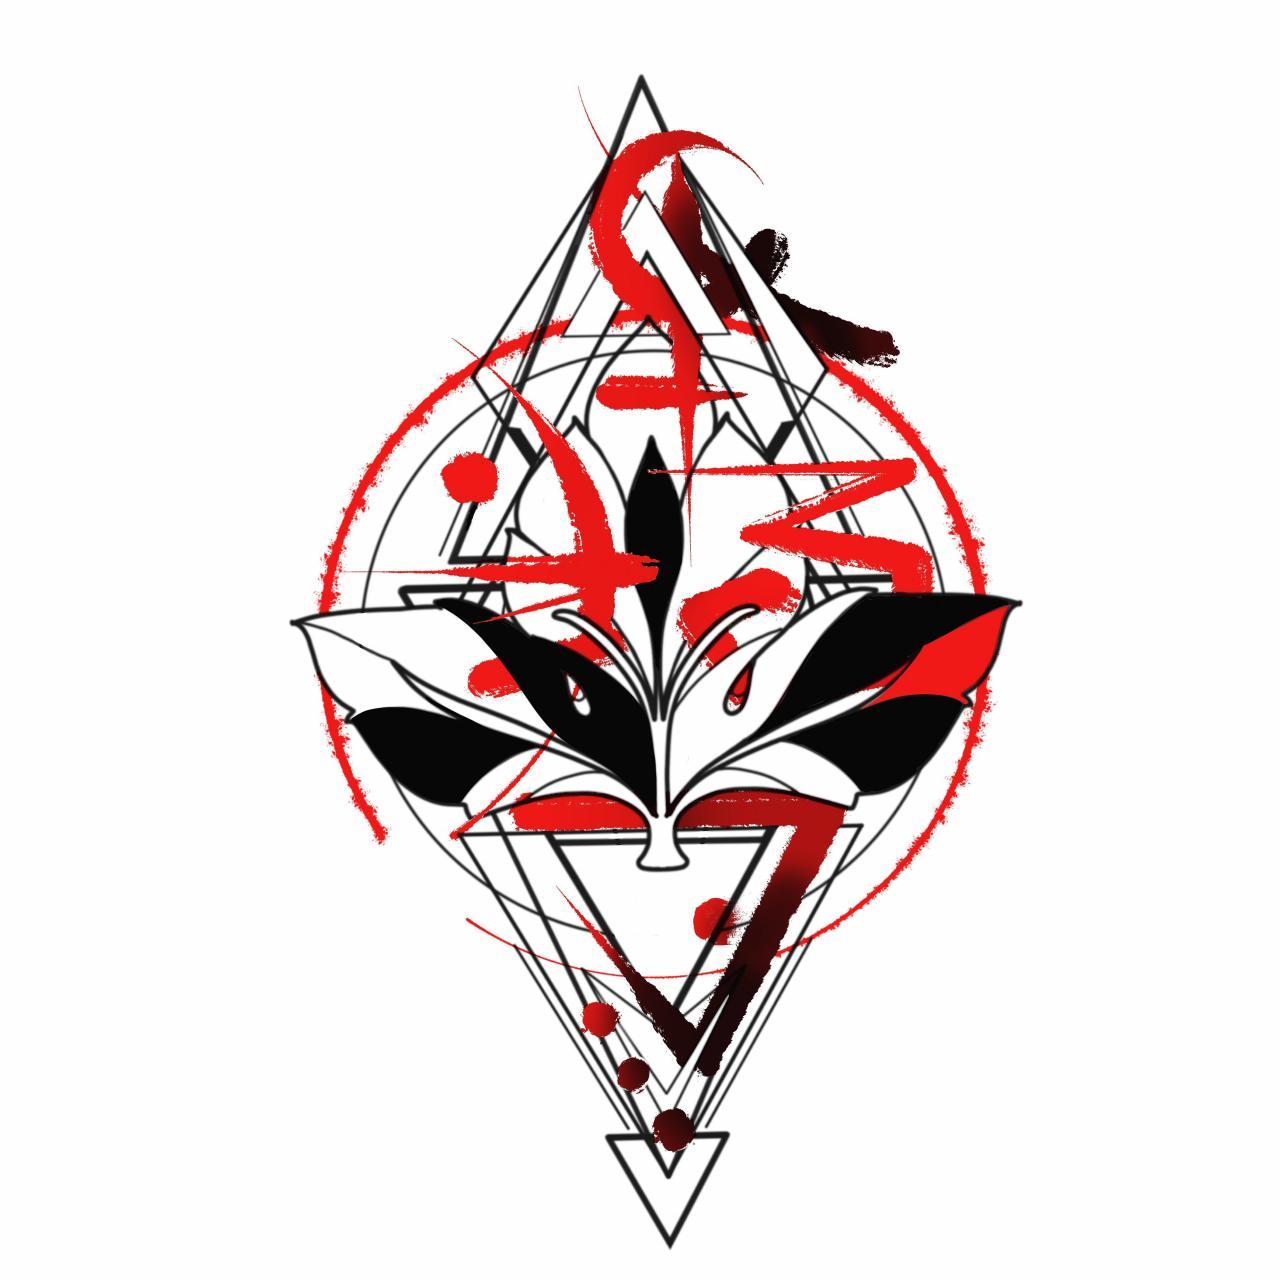 sigil tattoo - I'm open for commissions - PM for custom designs